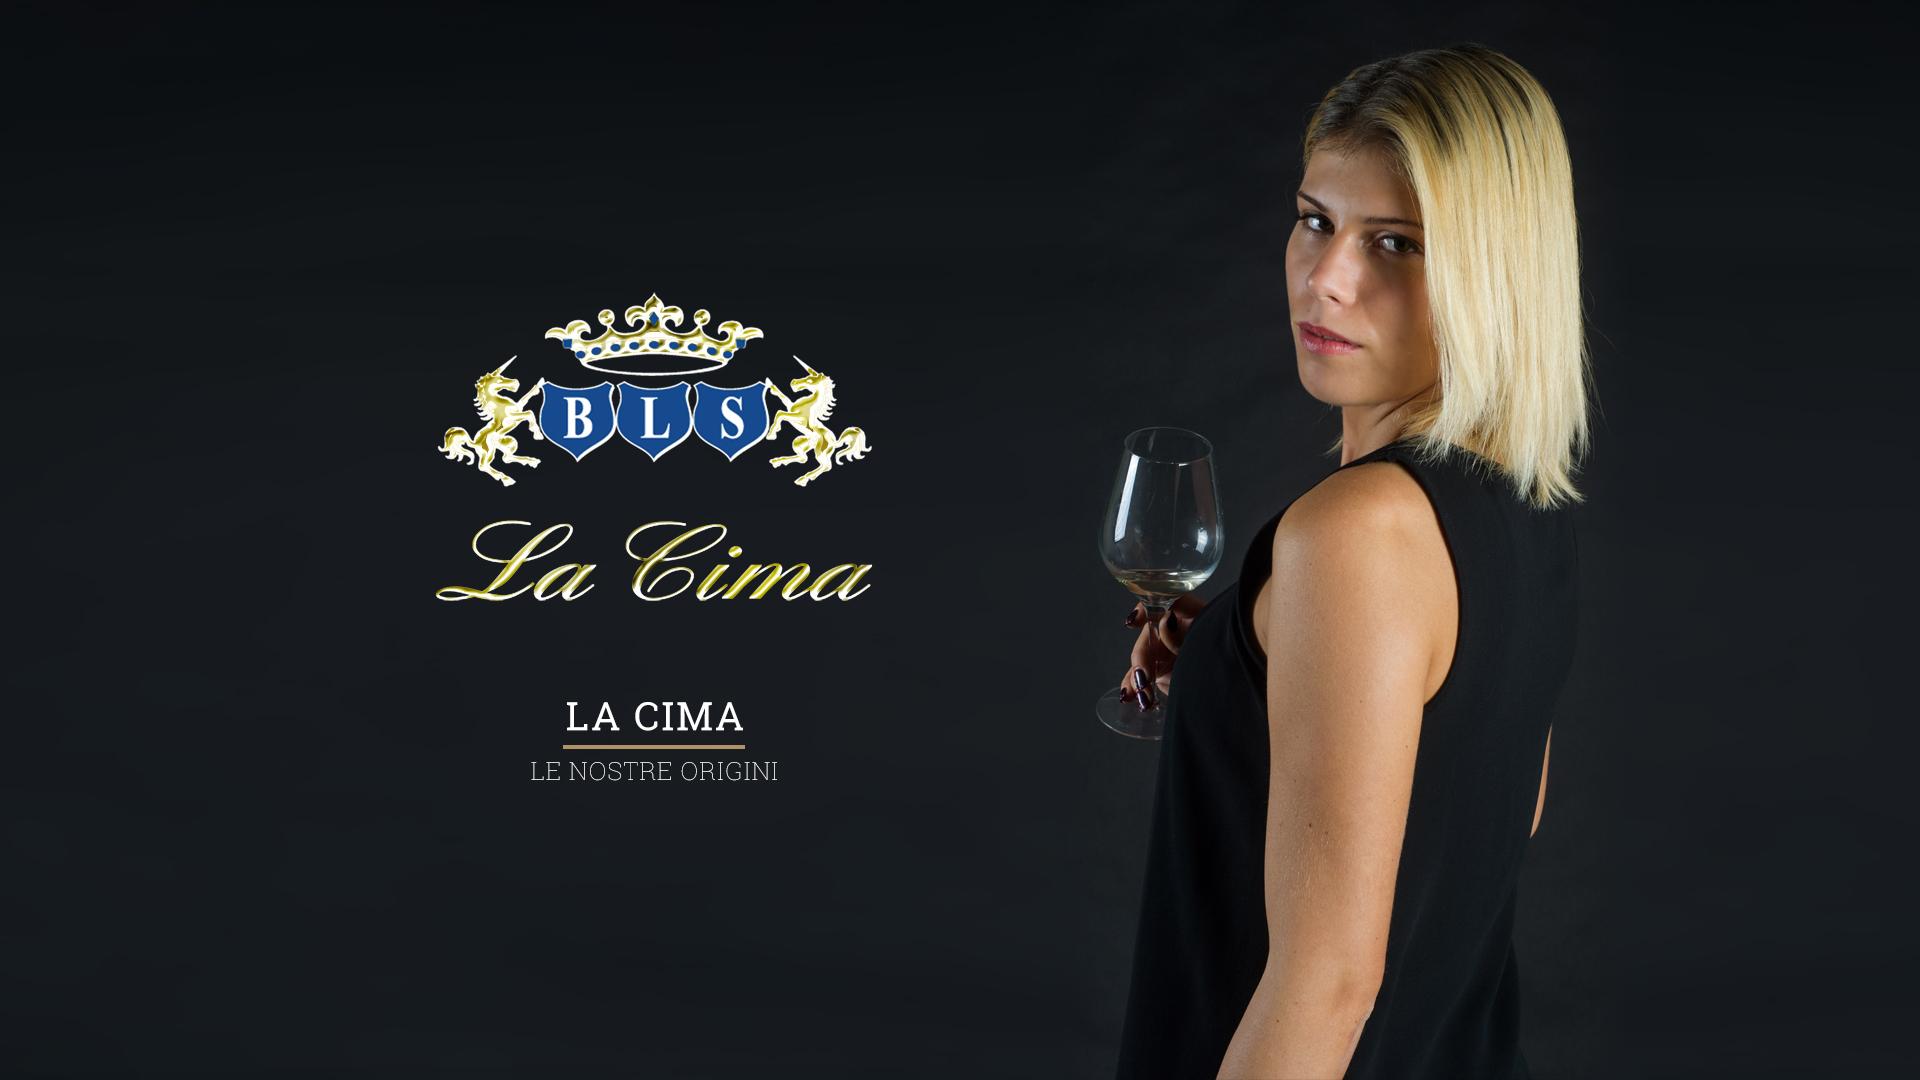 LA CIMA it